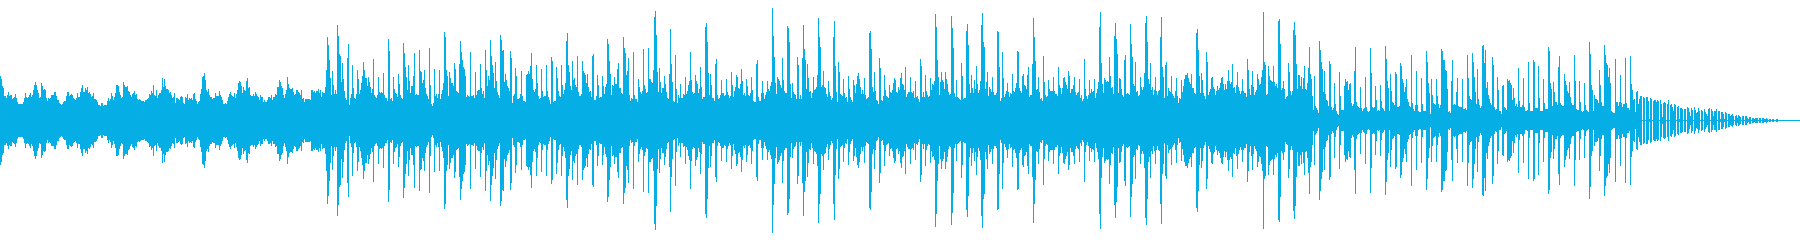 【CM】ダークで、無機質な映像美_02の再生済みの波形